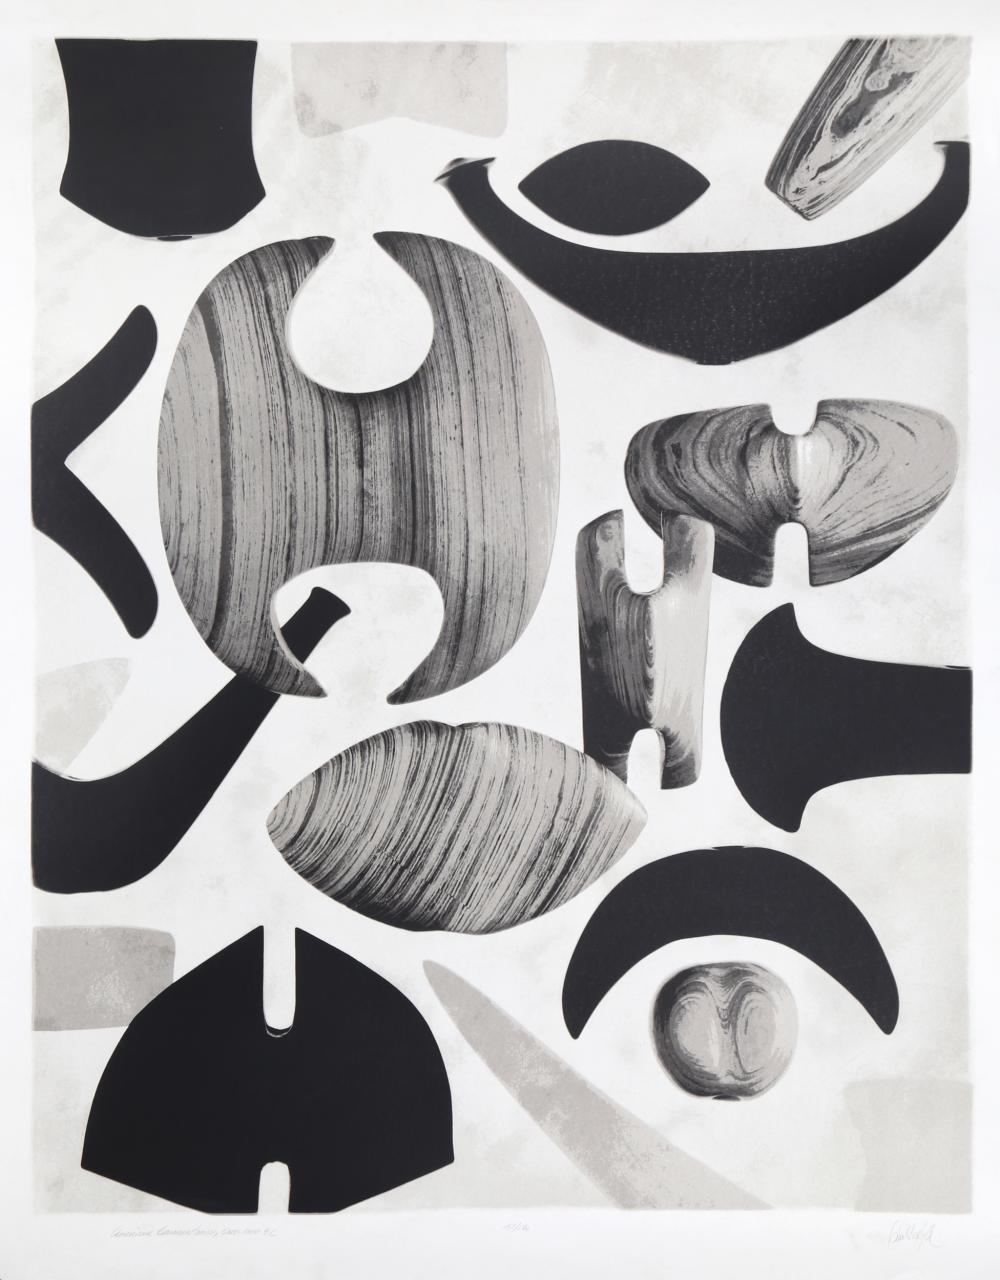 Corson Hirschfeld, American Bannerstones, 5000-1000 B.C., Mezzotint